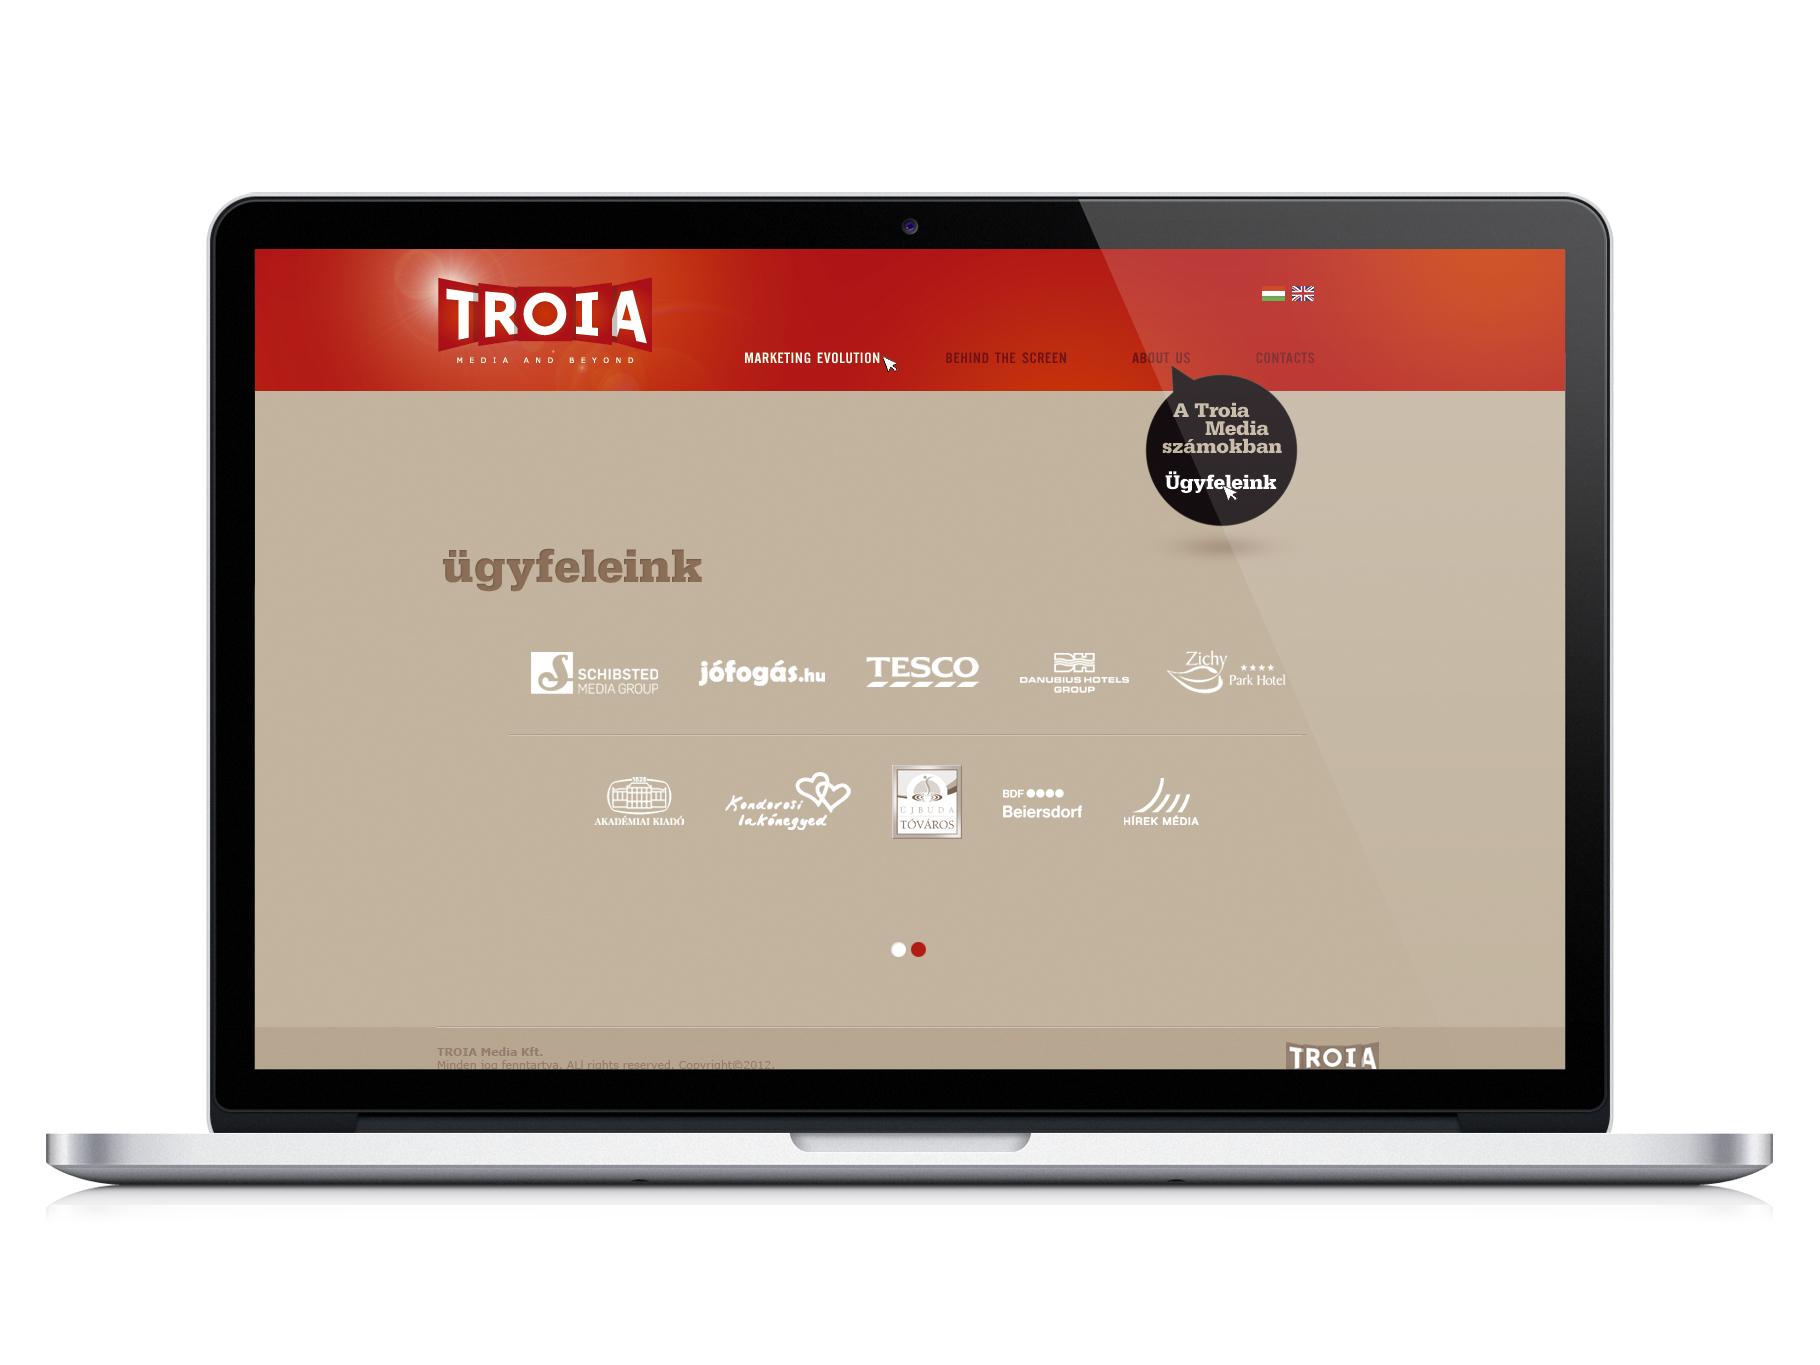 Troia Media 6